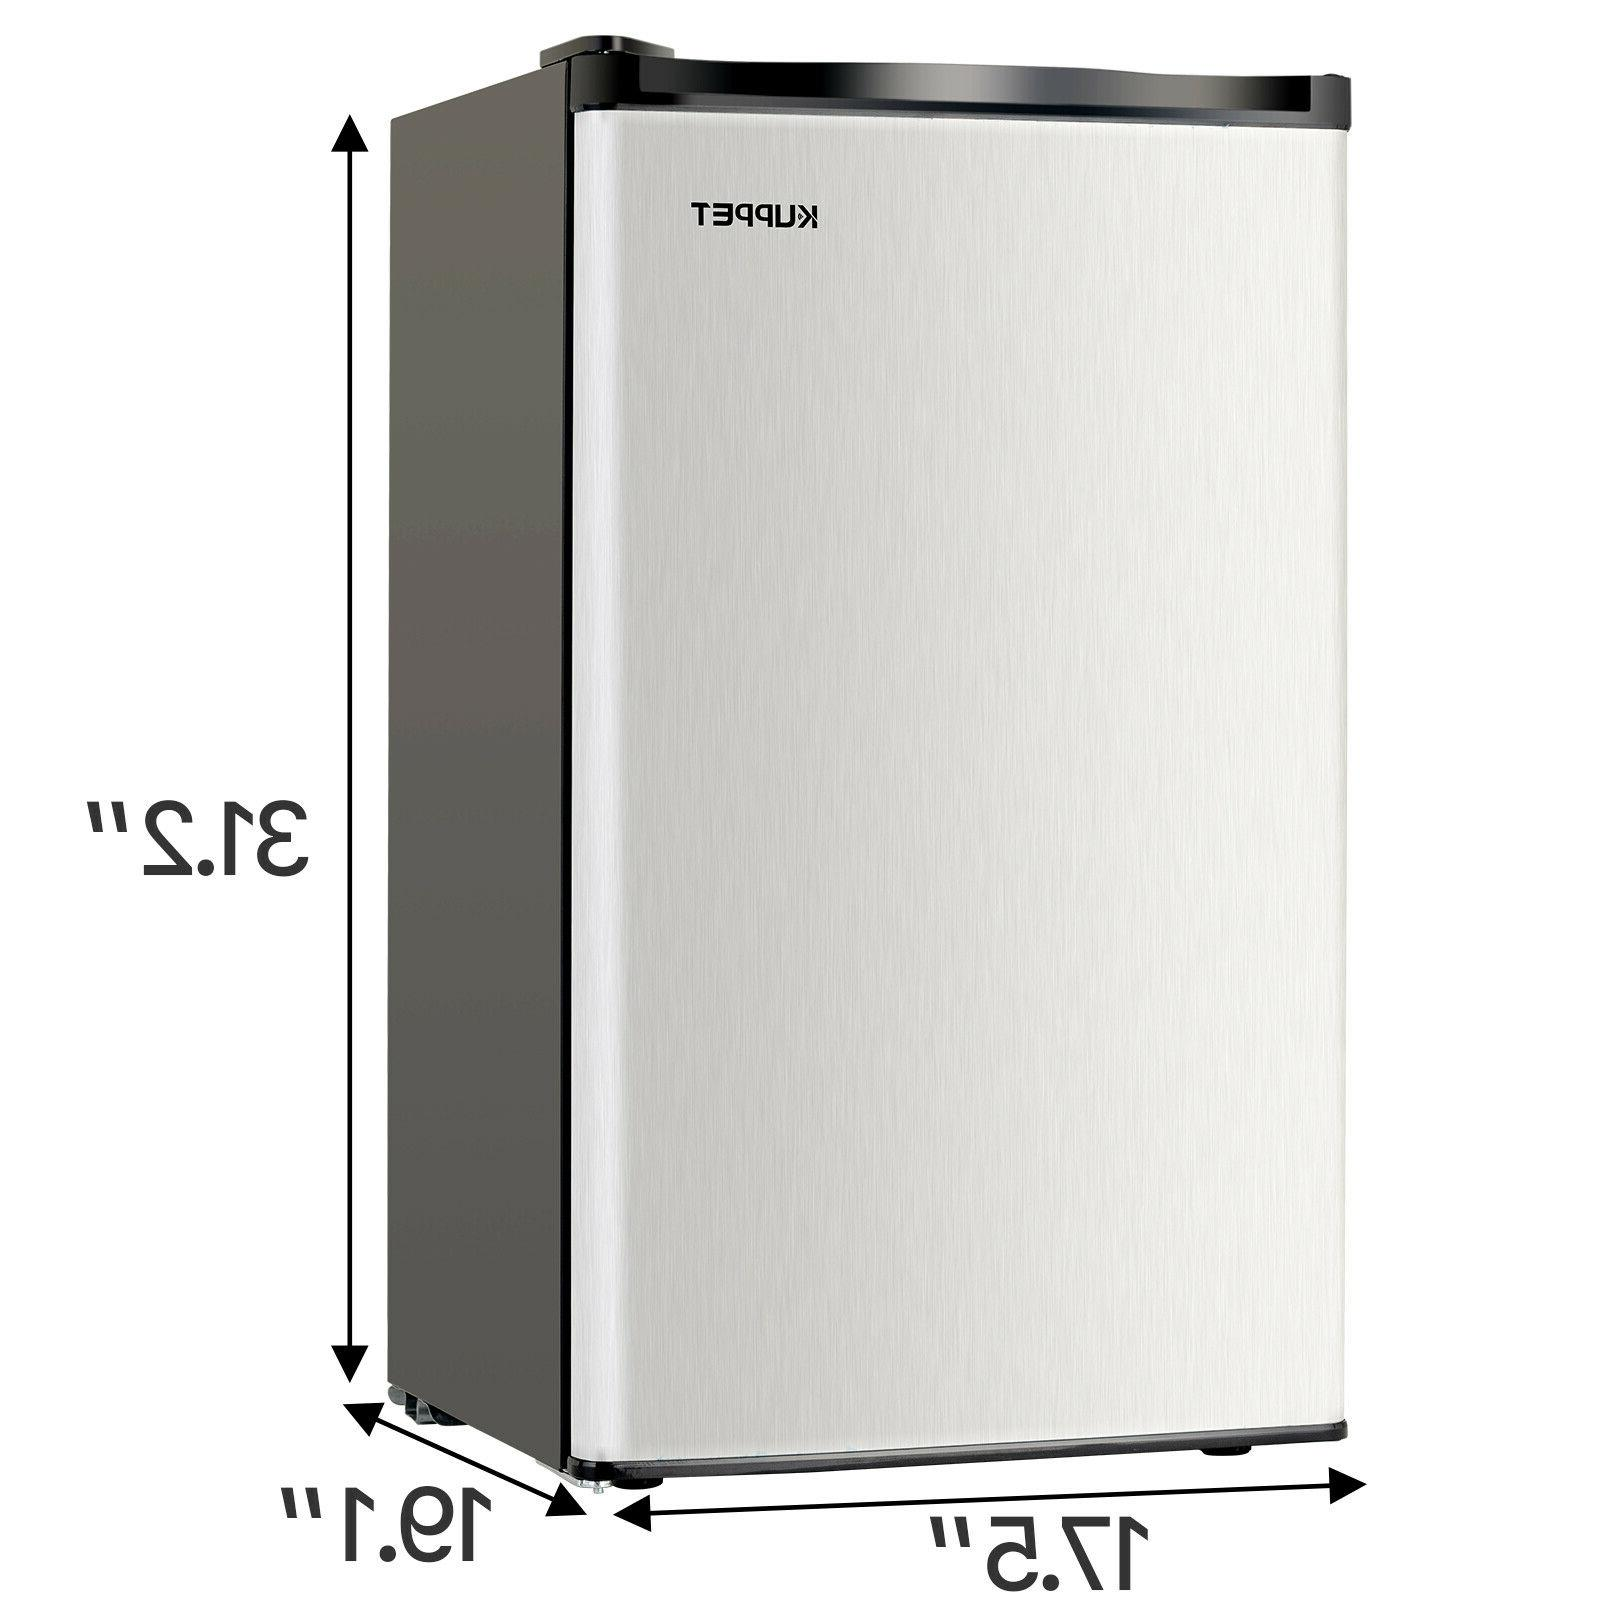 3.2 Mini Refrigerator Compact Fridge Freezer Black Silver